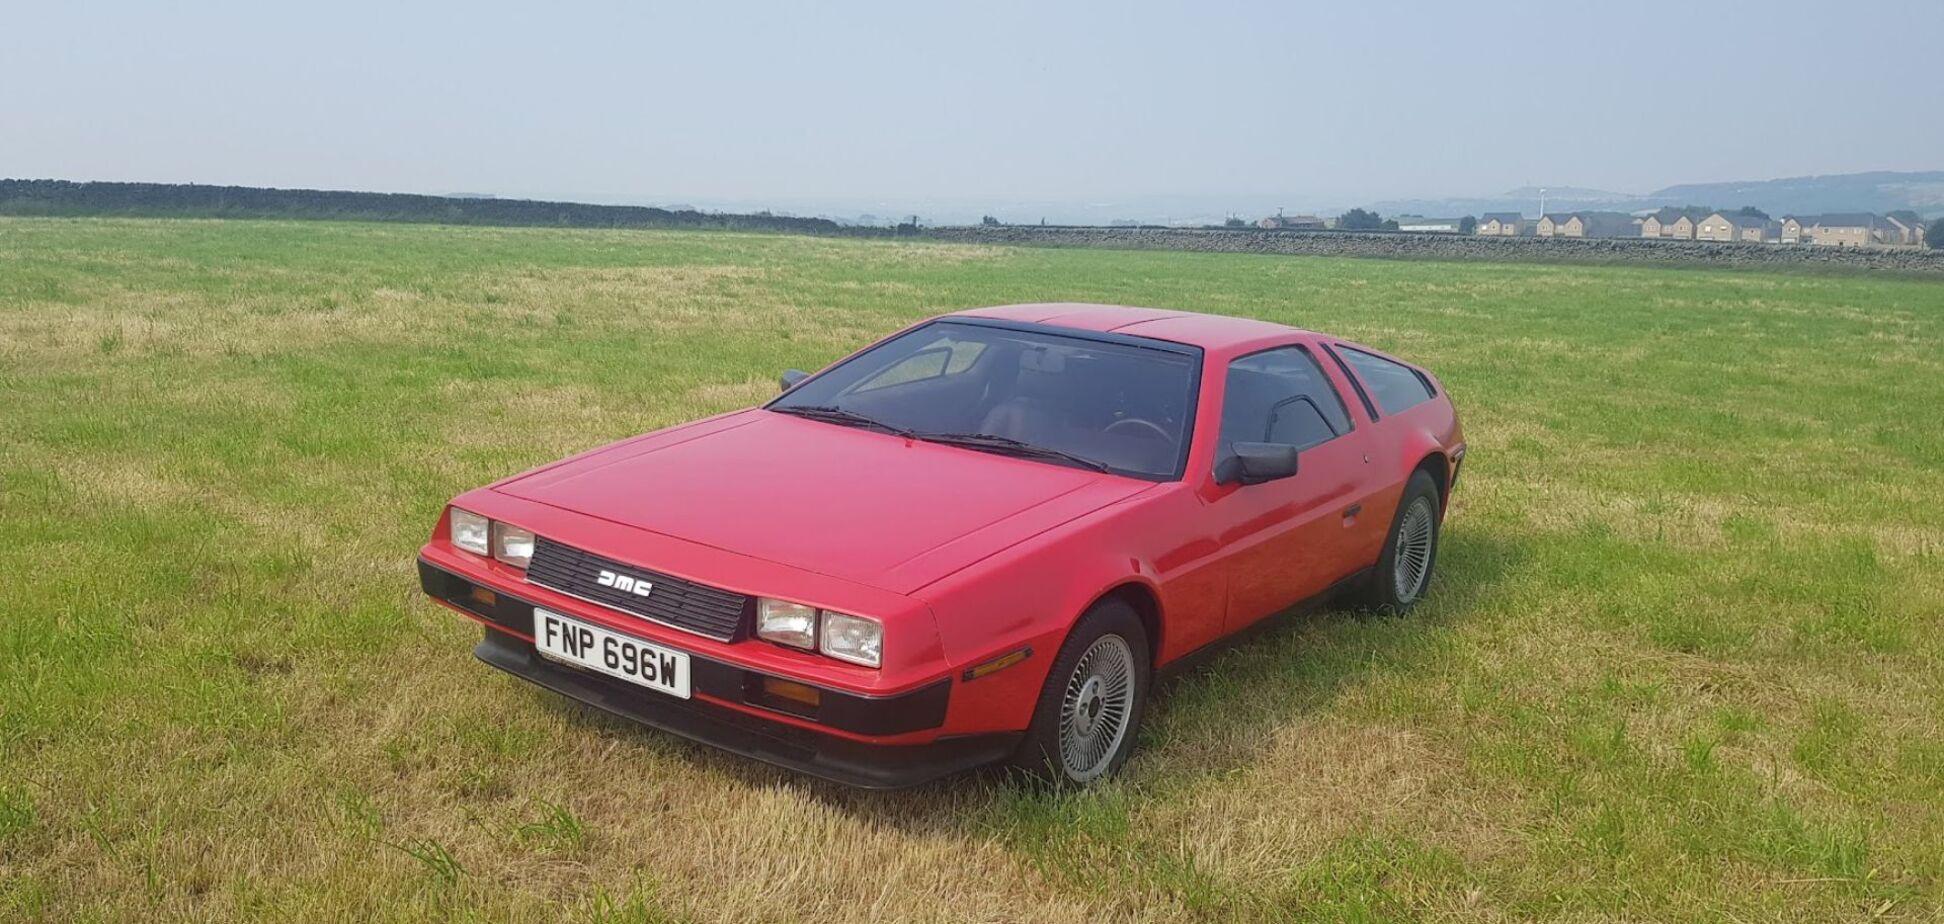 На аукционе выставили нестандартное купе DeLorean